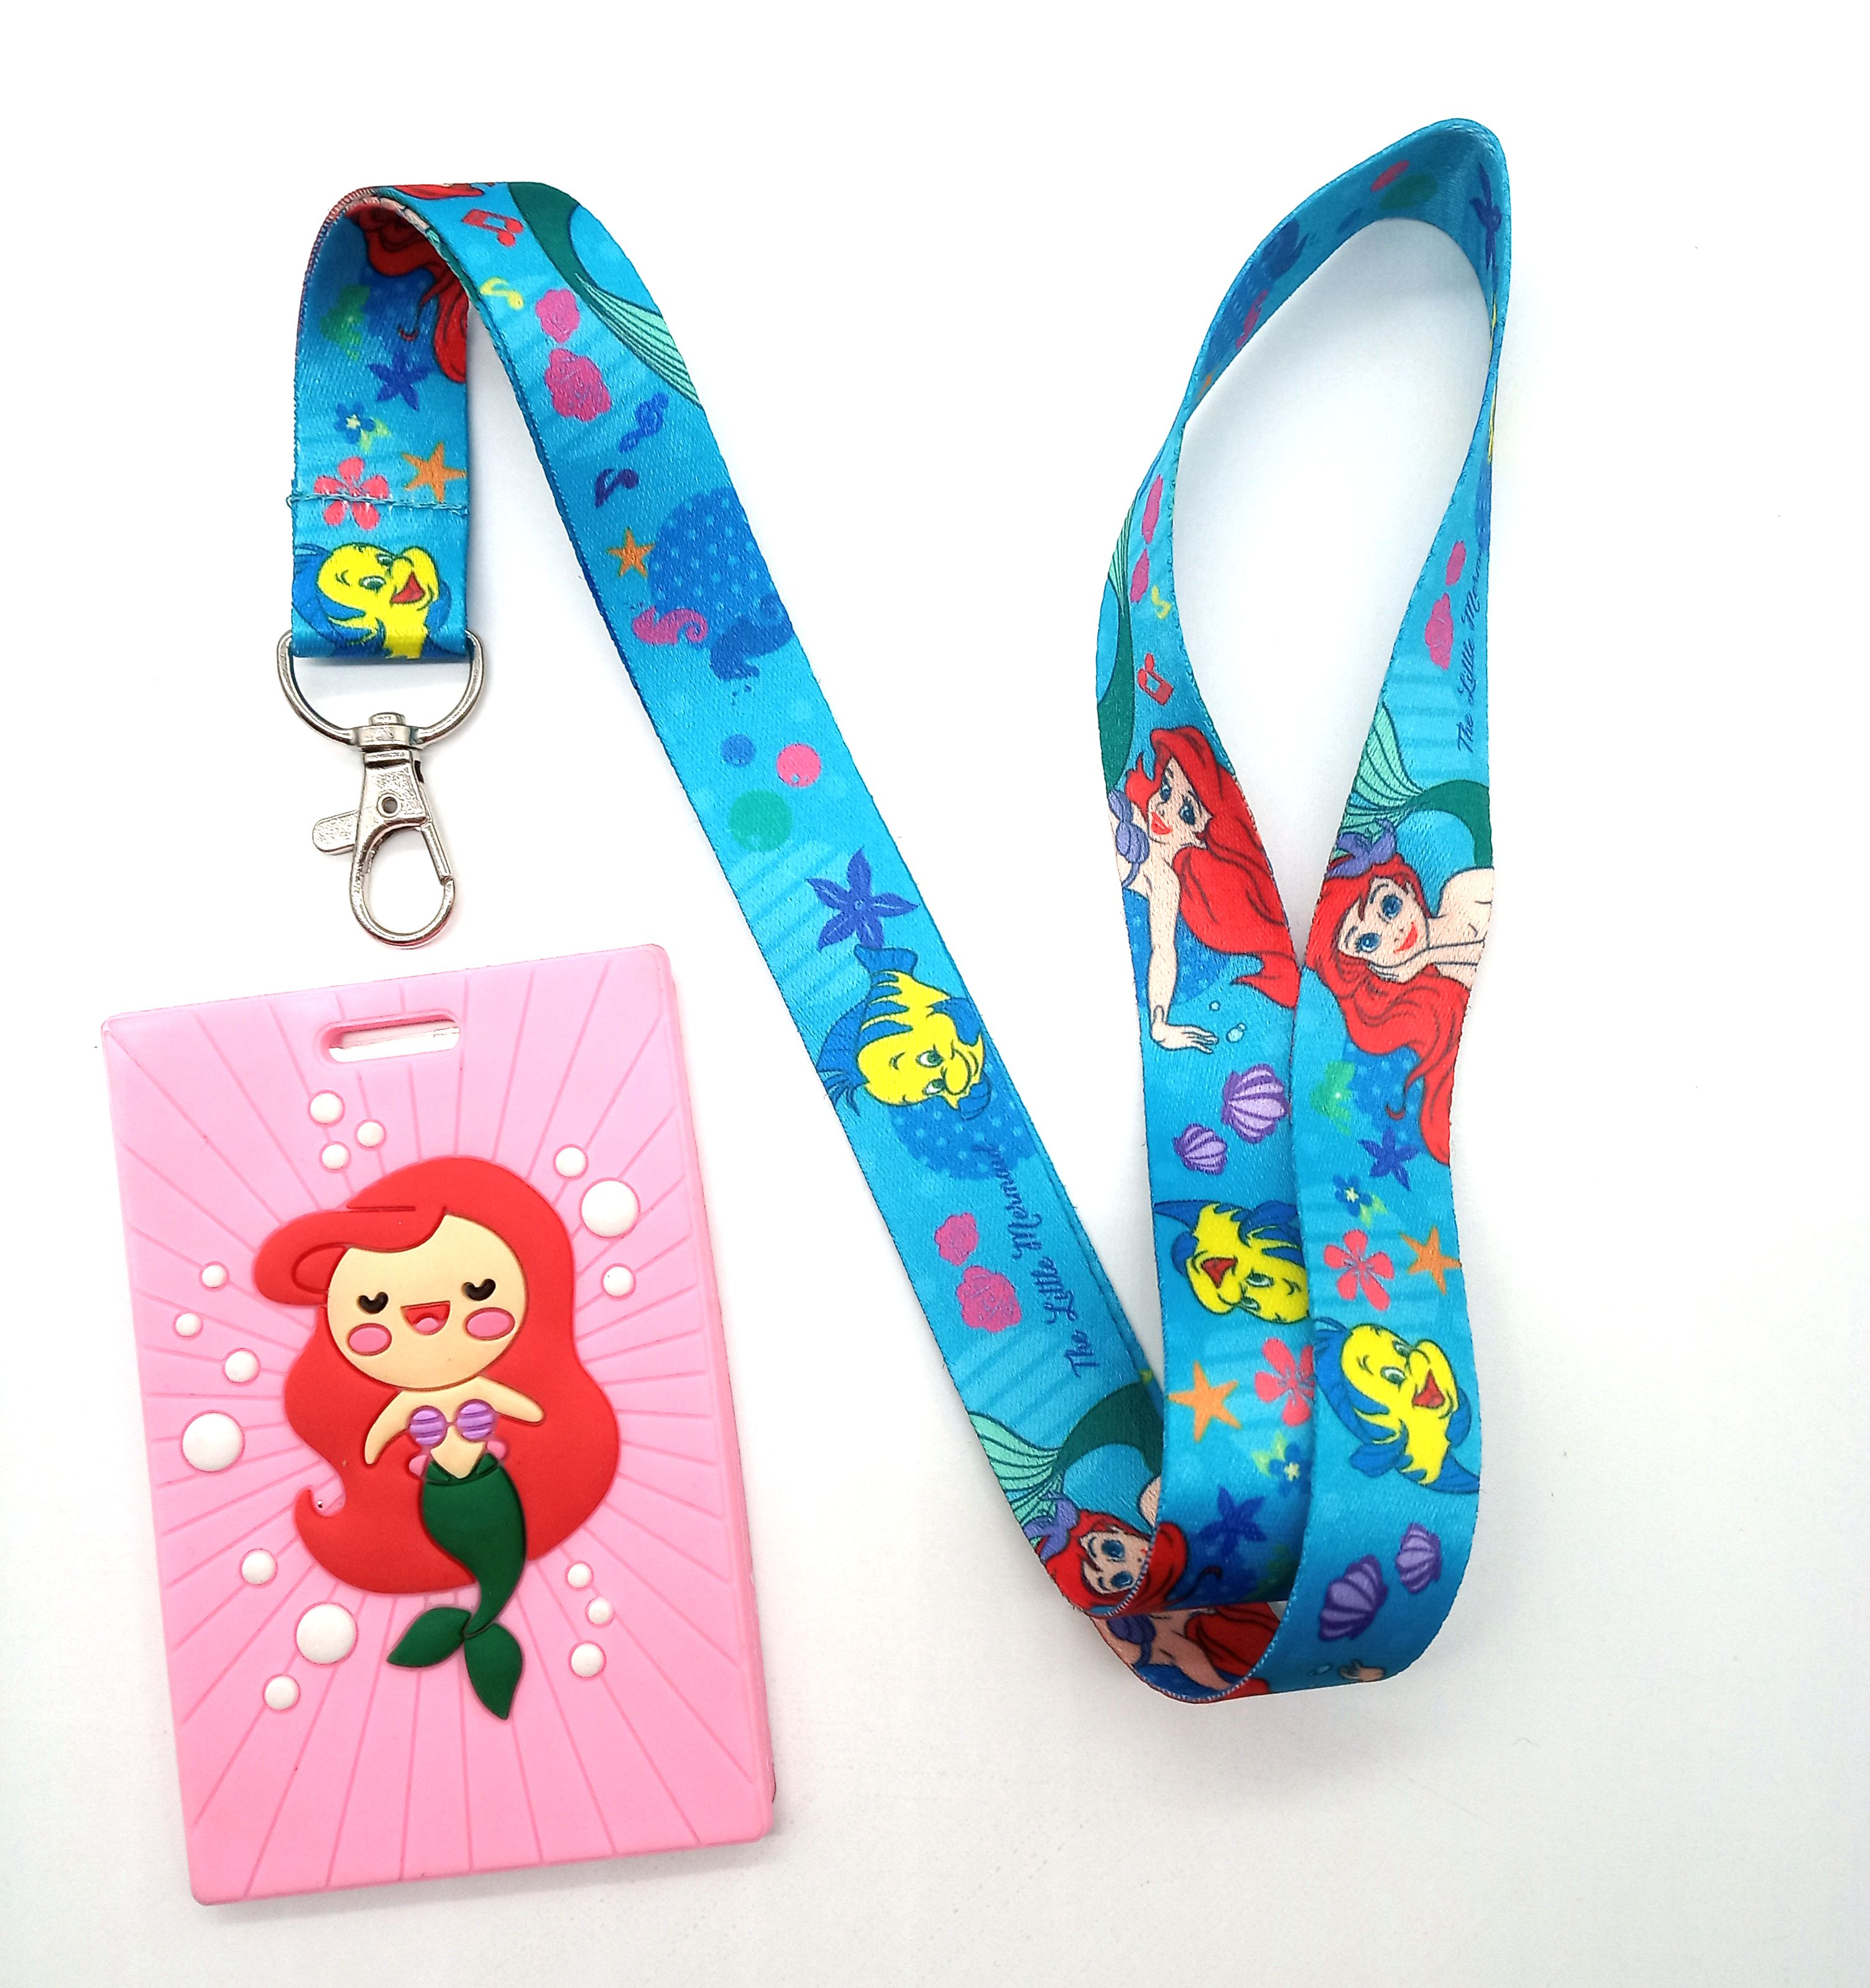 1 Pcs Cartoon Ariel Princess  Lanyard Key Lanyard Cosplay Badge ID Cards Holders Neck Straps Keyrchains K20